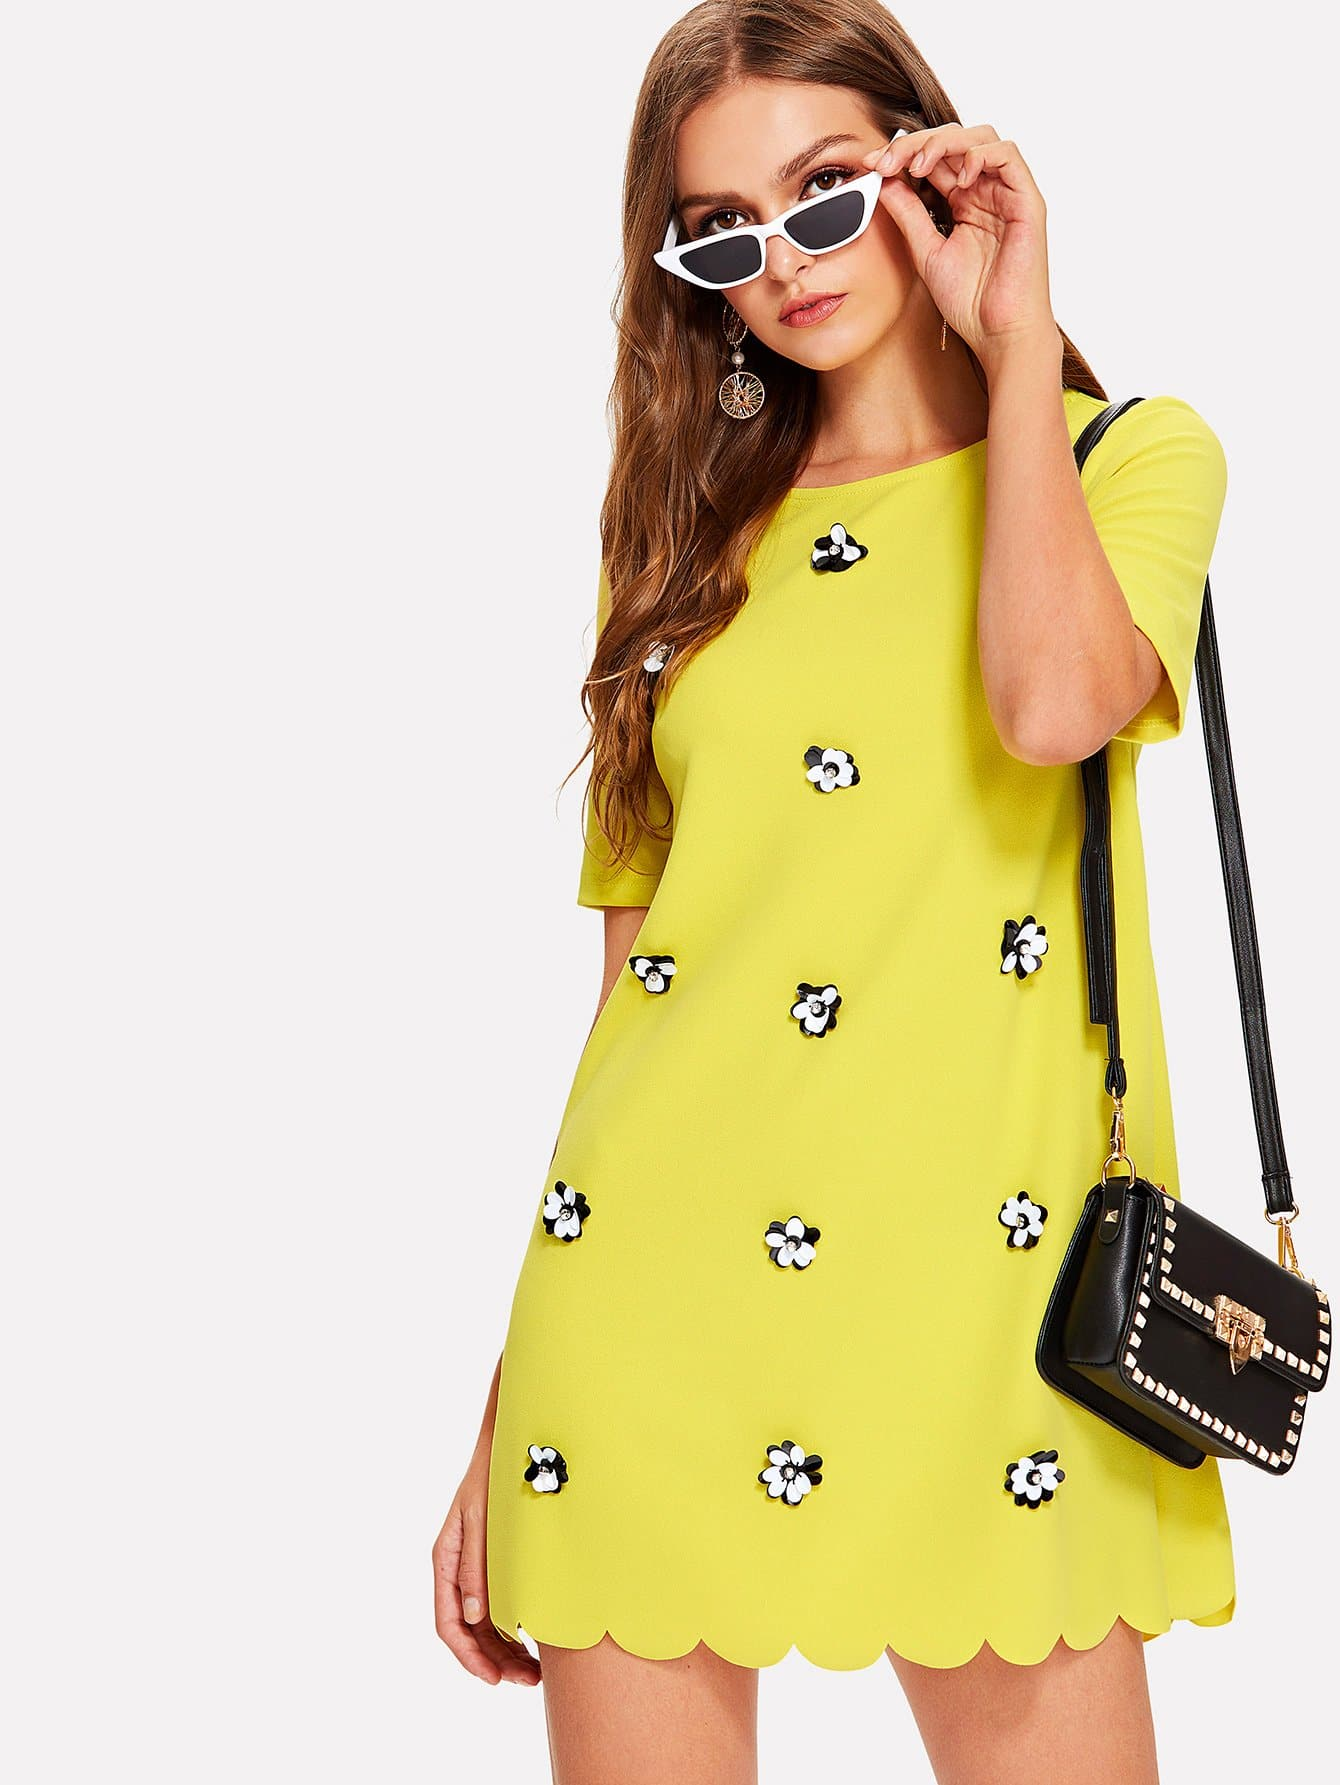 Applique Scallop Trim Tunic Dress embroidered trim tunic dress